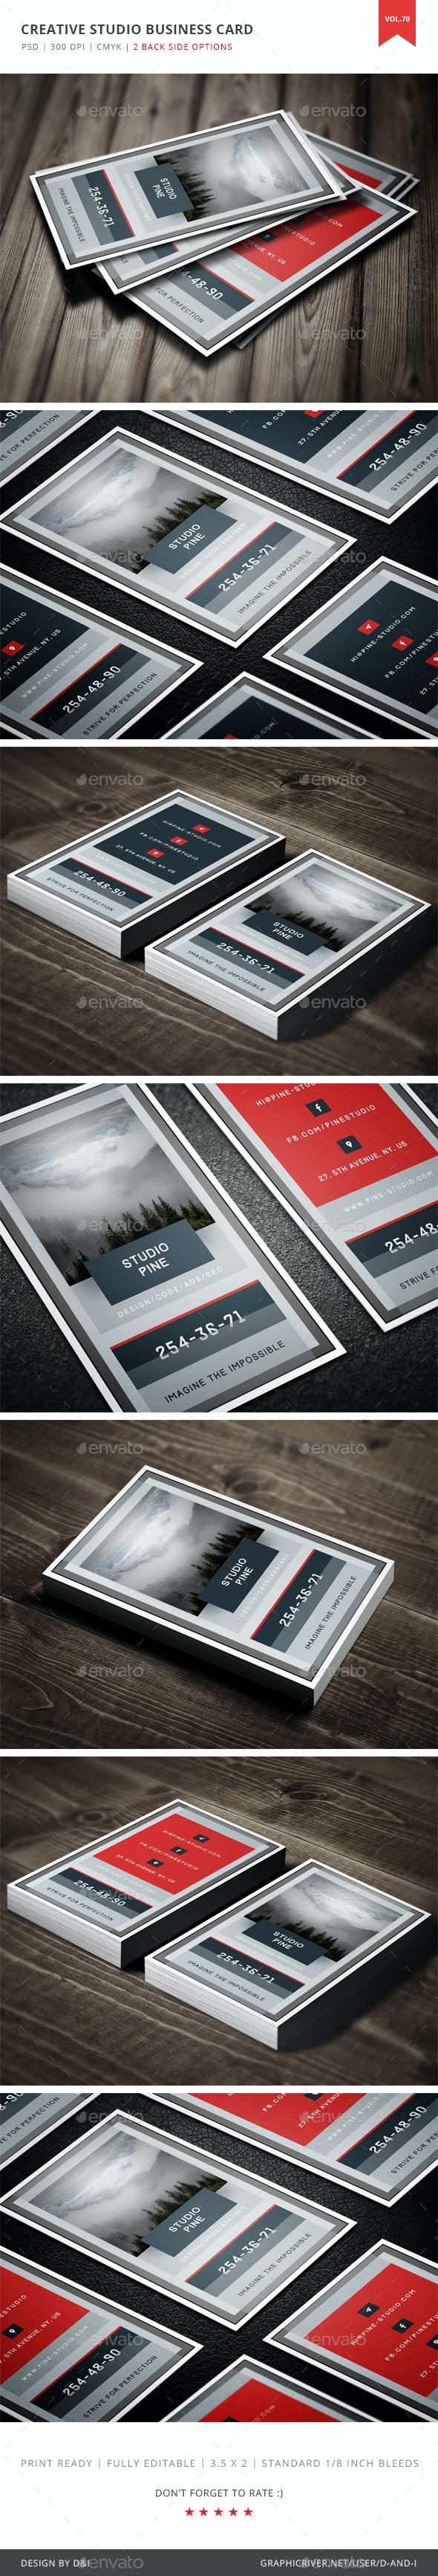 Creative Studio Business Card - Vol. 70 - Creative Business Cards